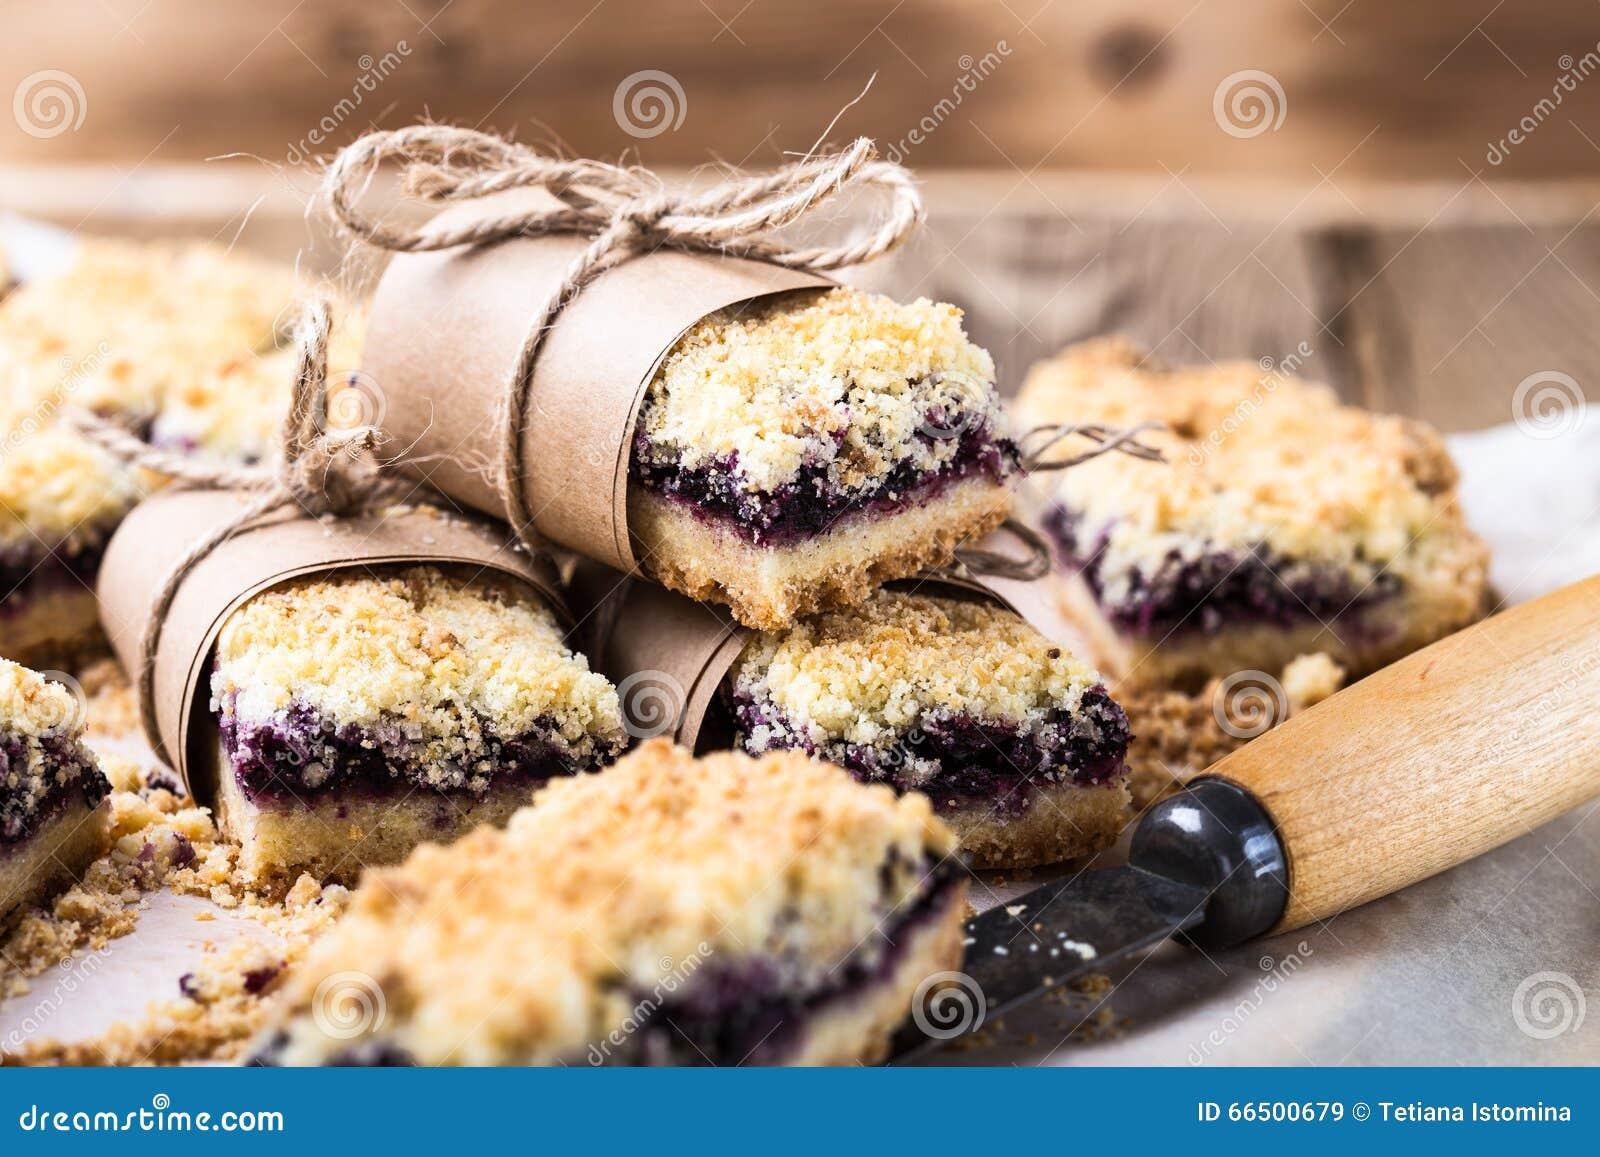 Blueberries crumble bars